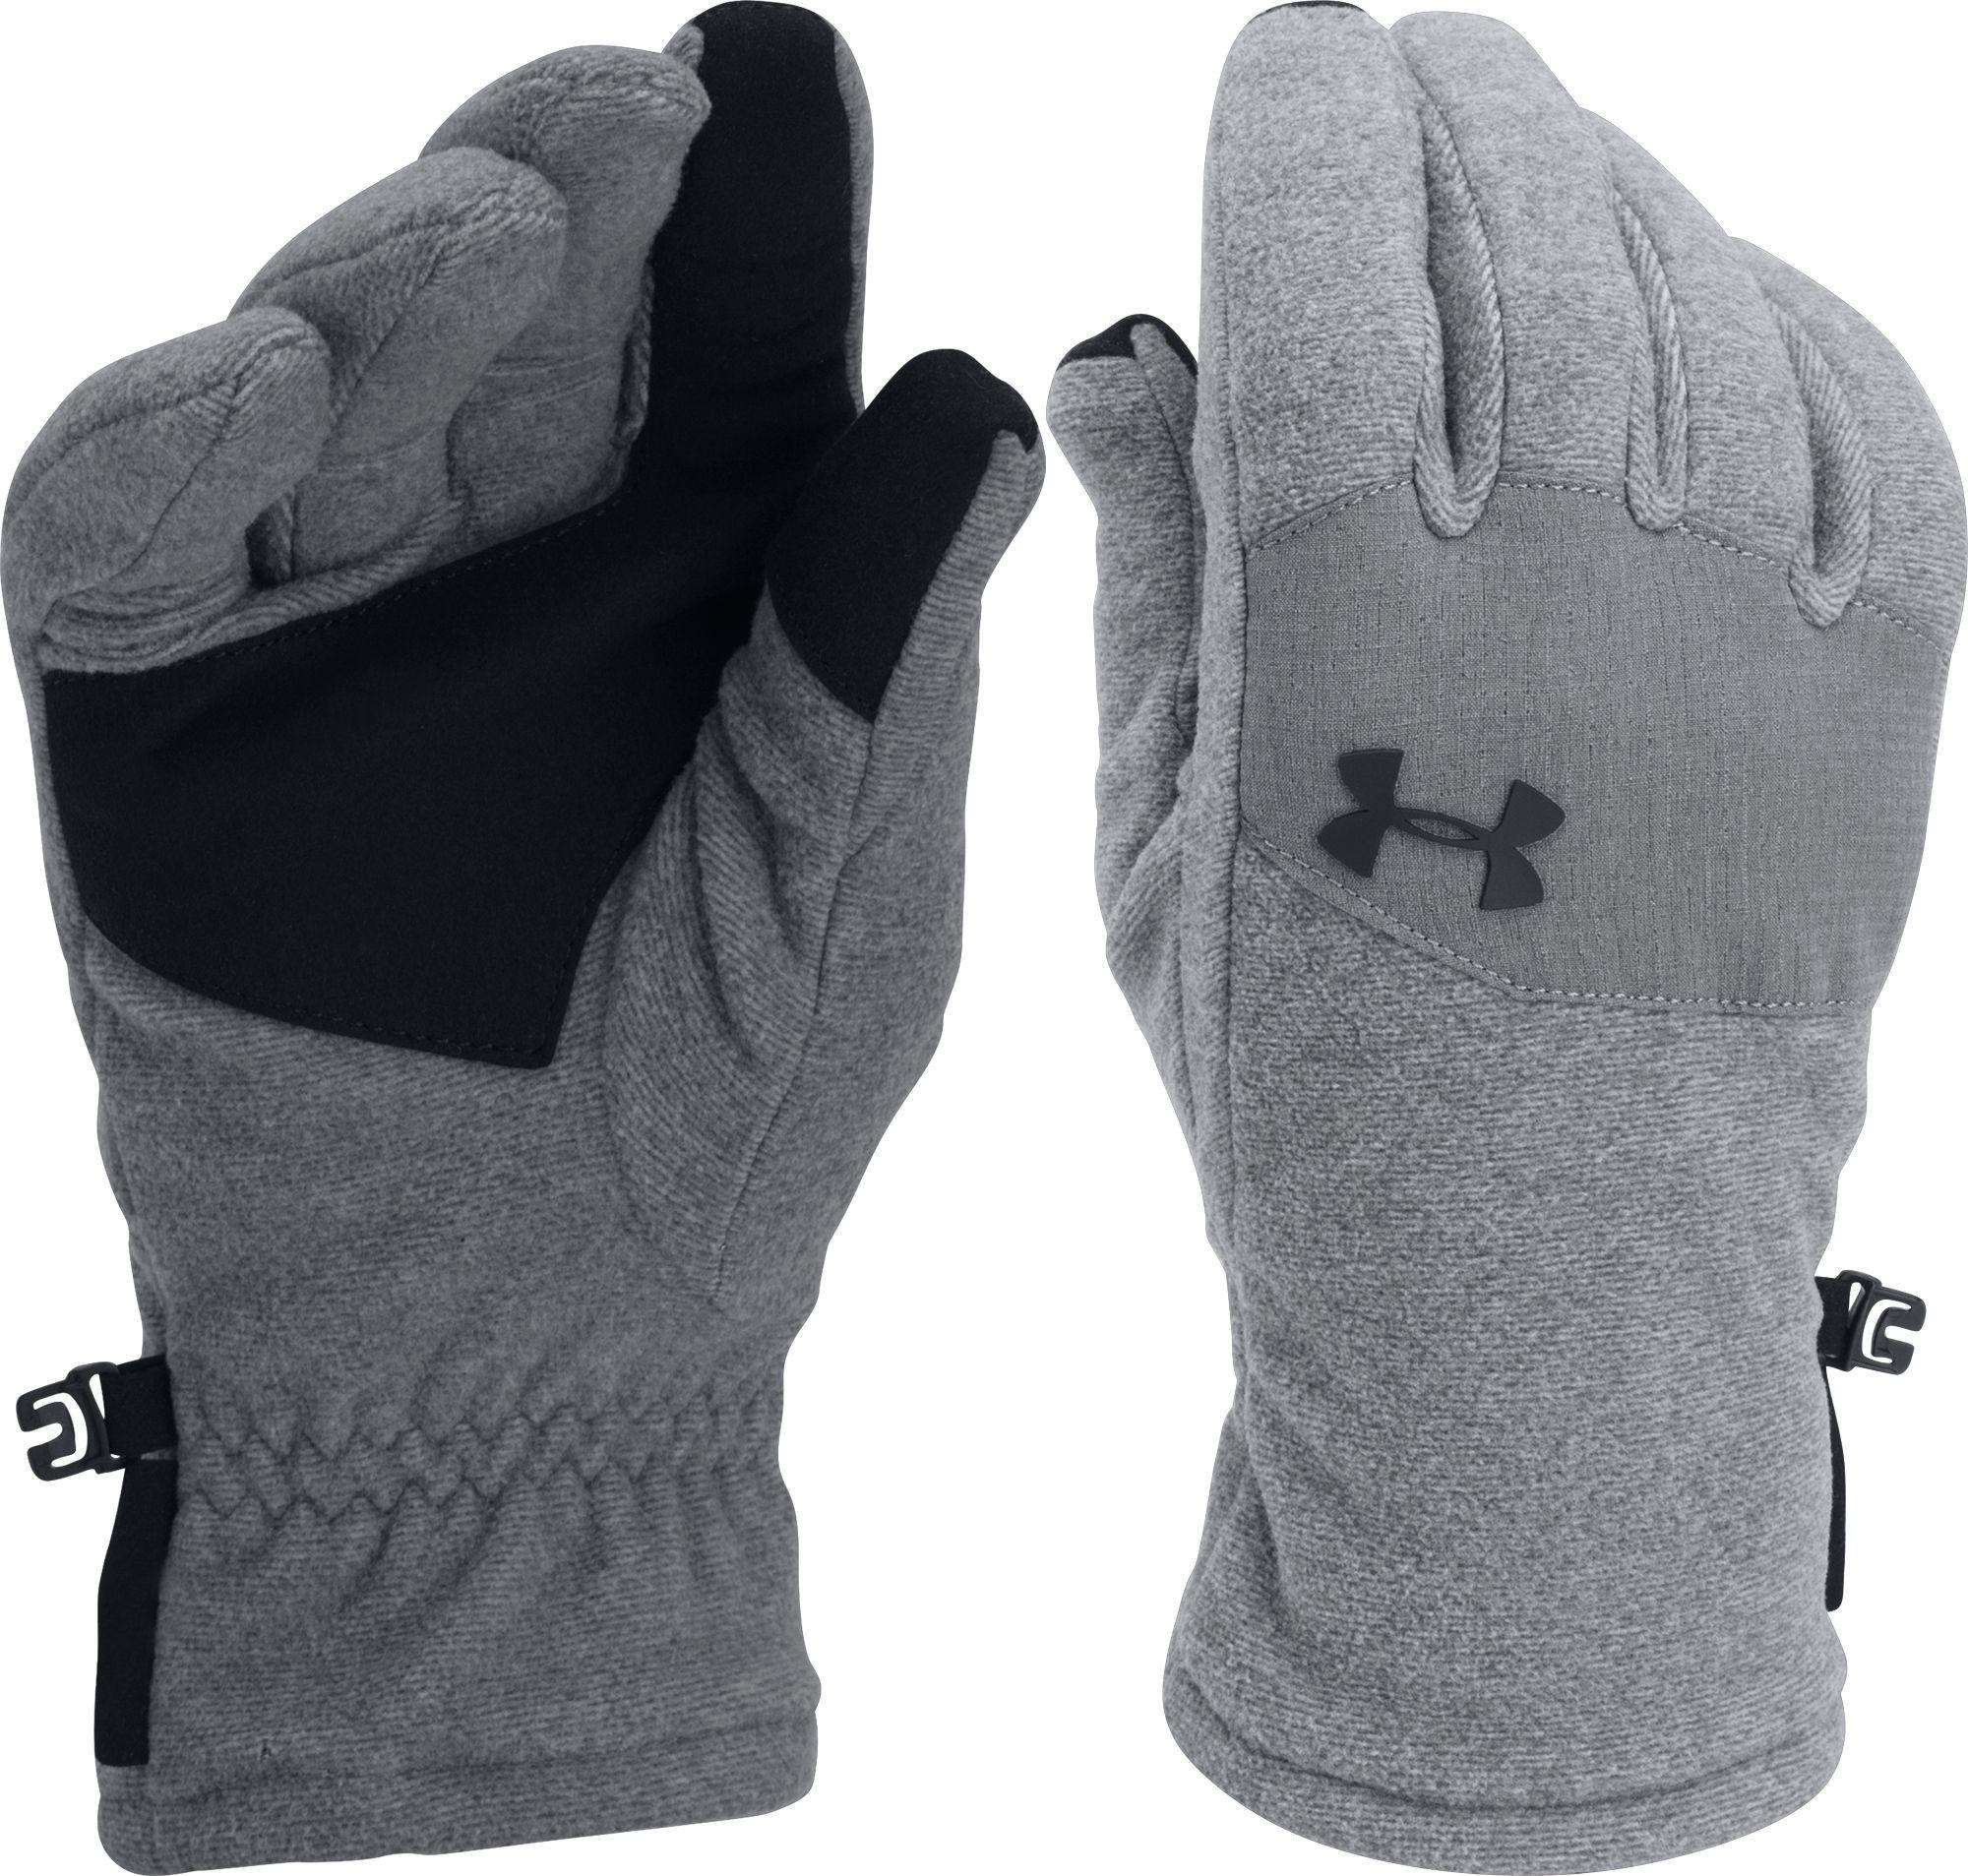 Lyst - Under Armour Coldgear Infrared Fleece Gloves 2.0 in Black for Men 20c2476dfb7d